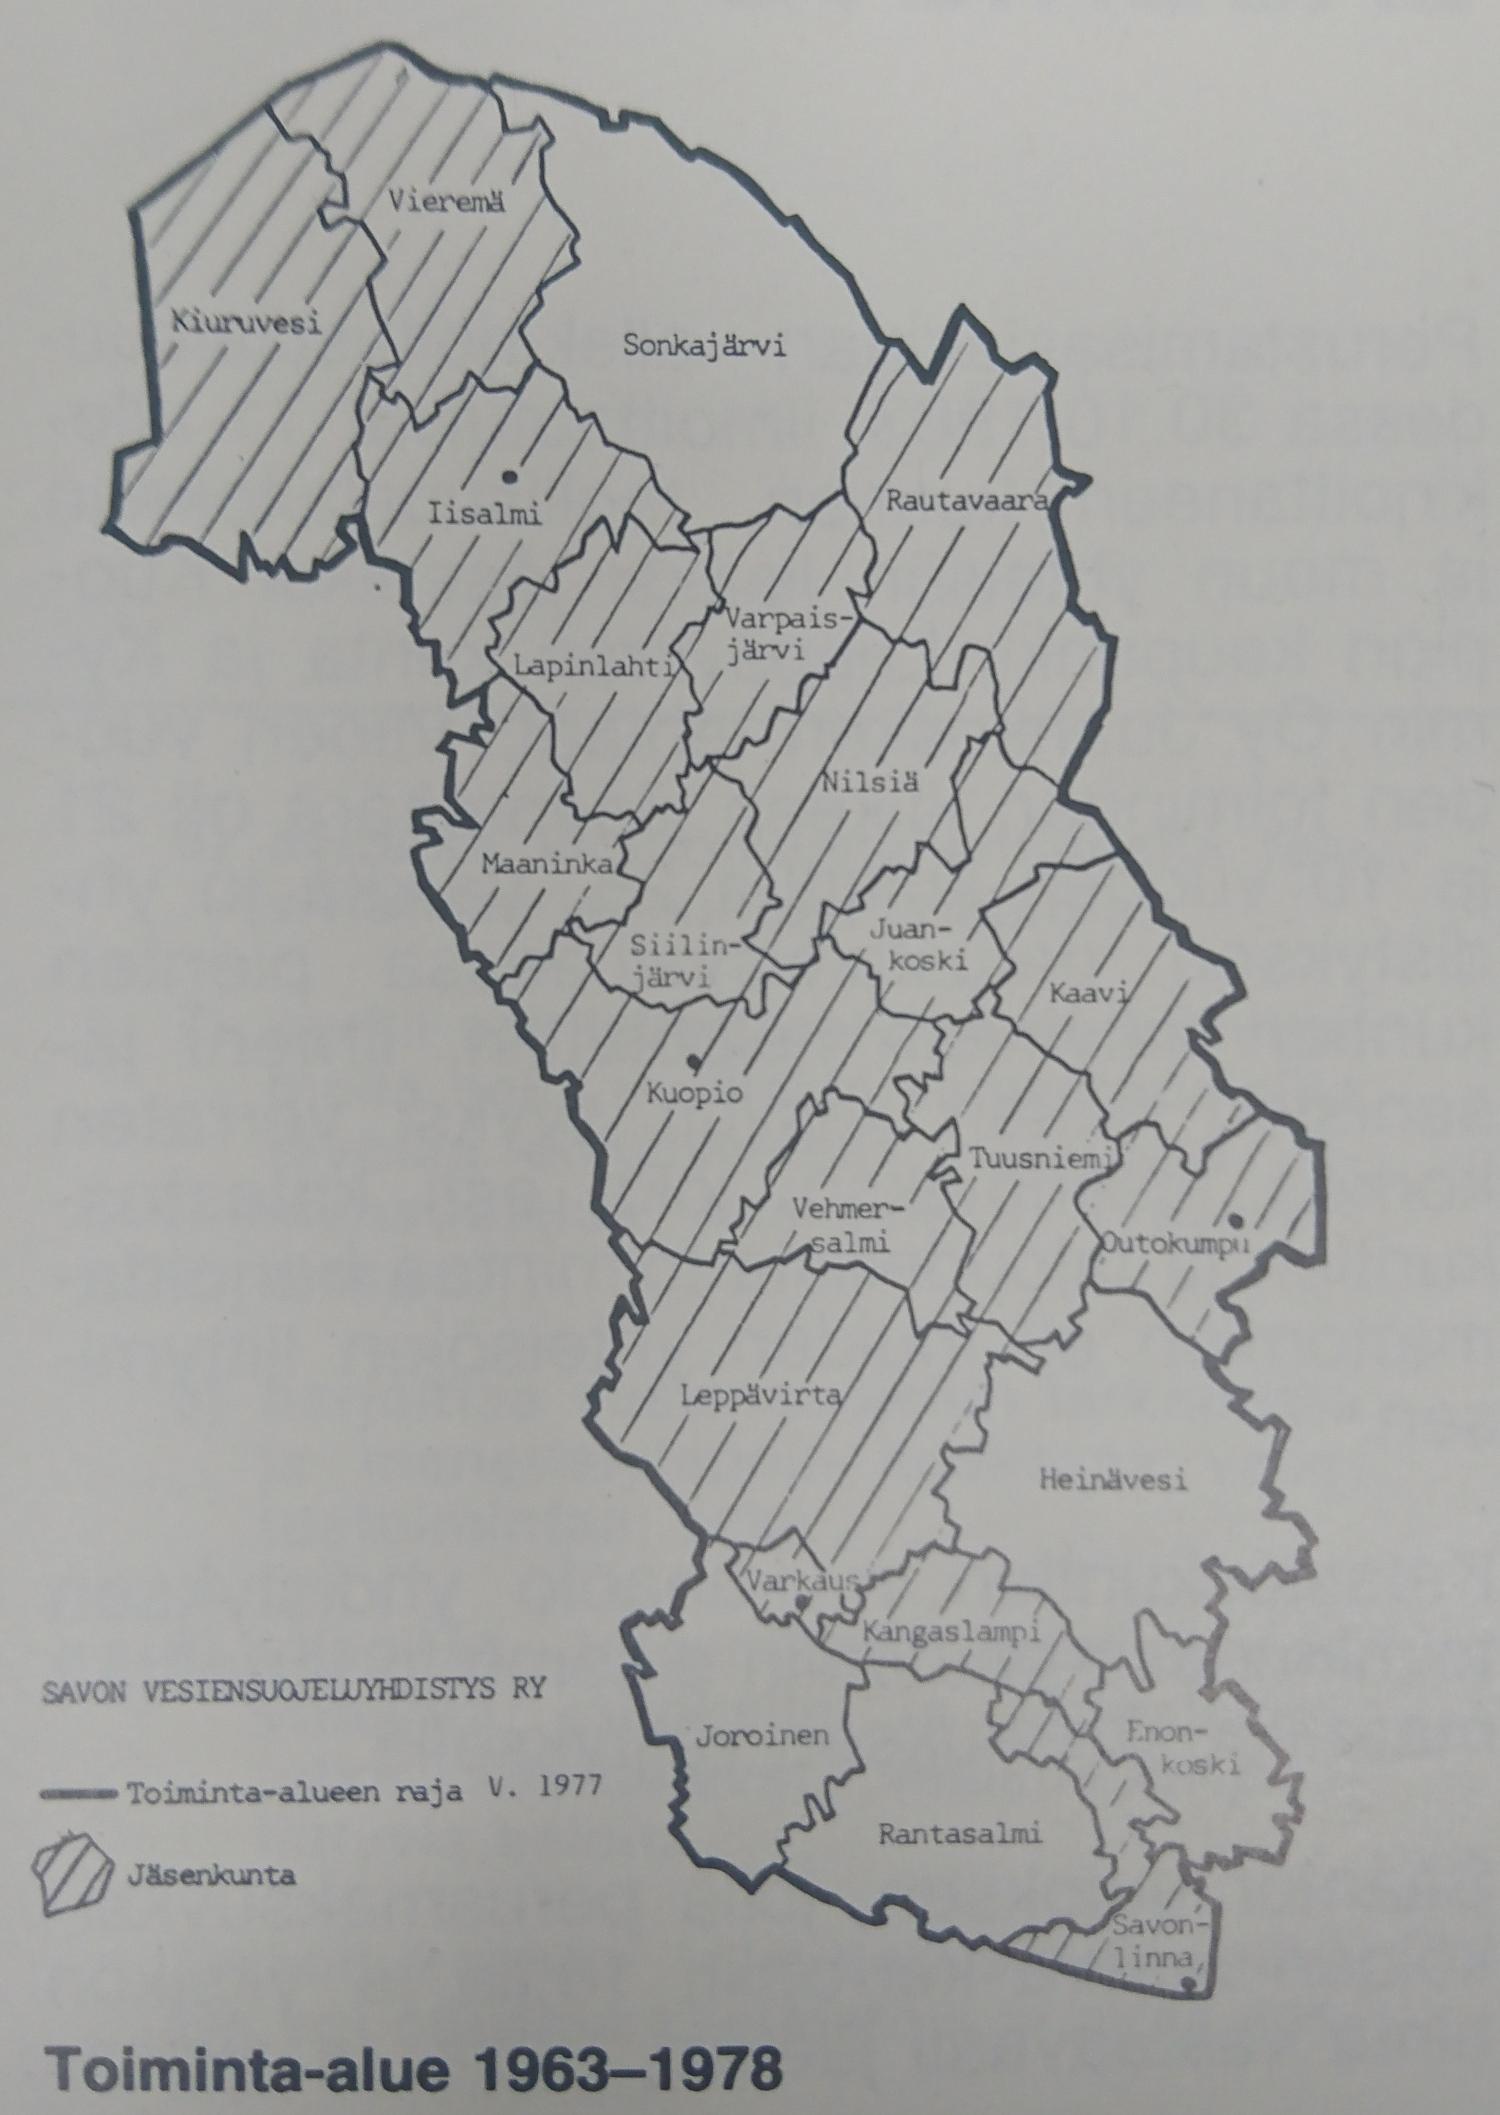 Toiminta-alue 1963